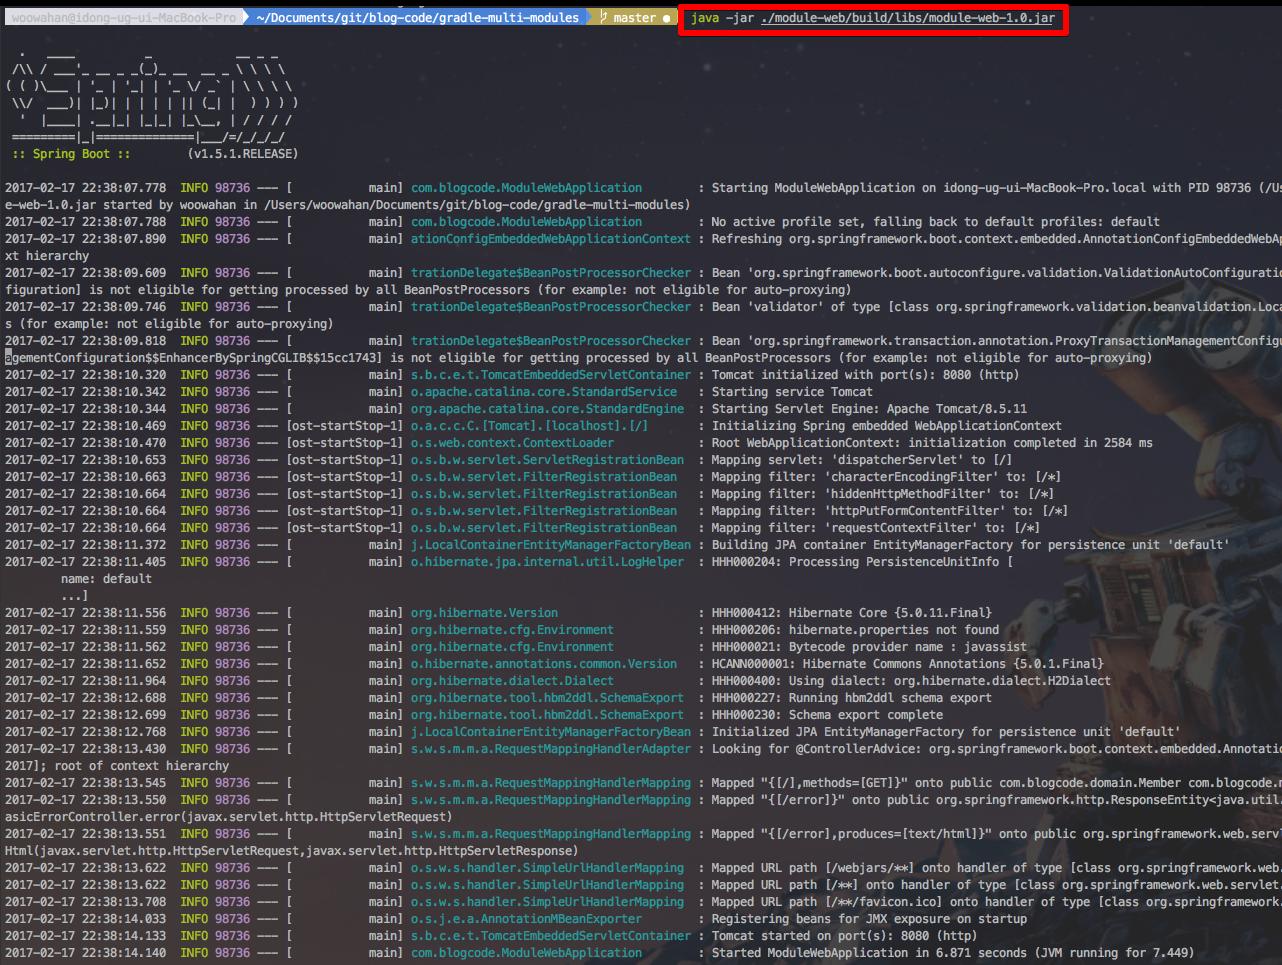 module-web 실행